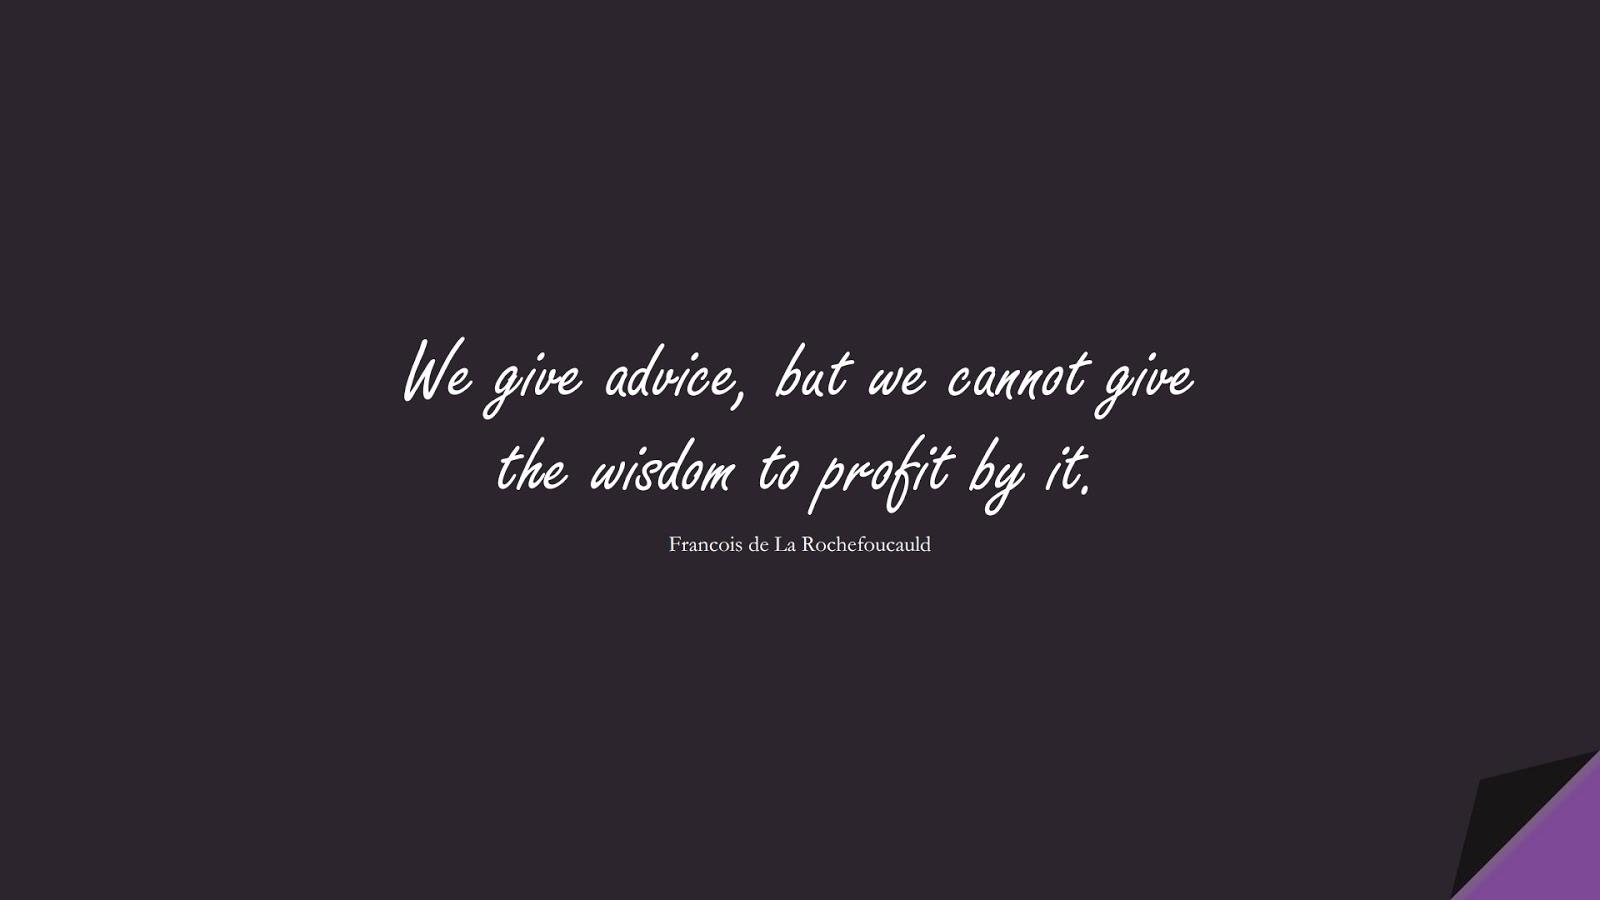 We give advice, but we cannot give the wisdom to profit by it. (Francois de La Rochefoucauld);  #WordsofWisdom